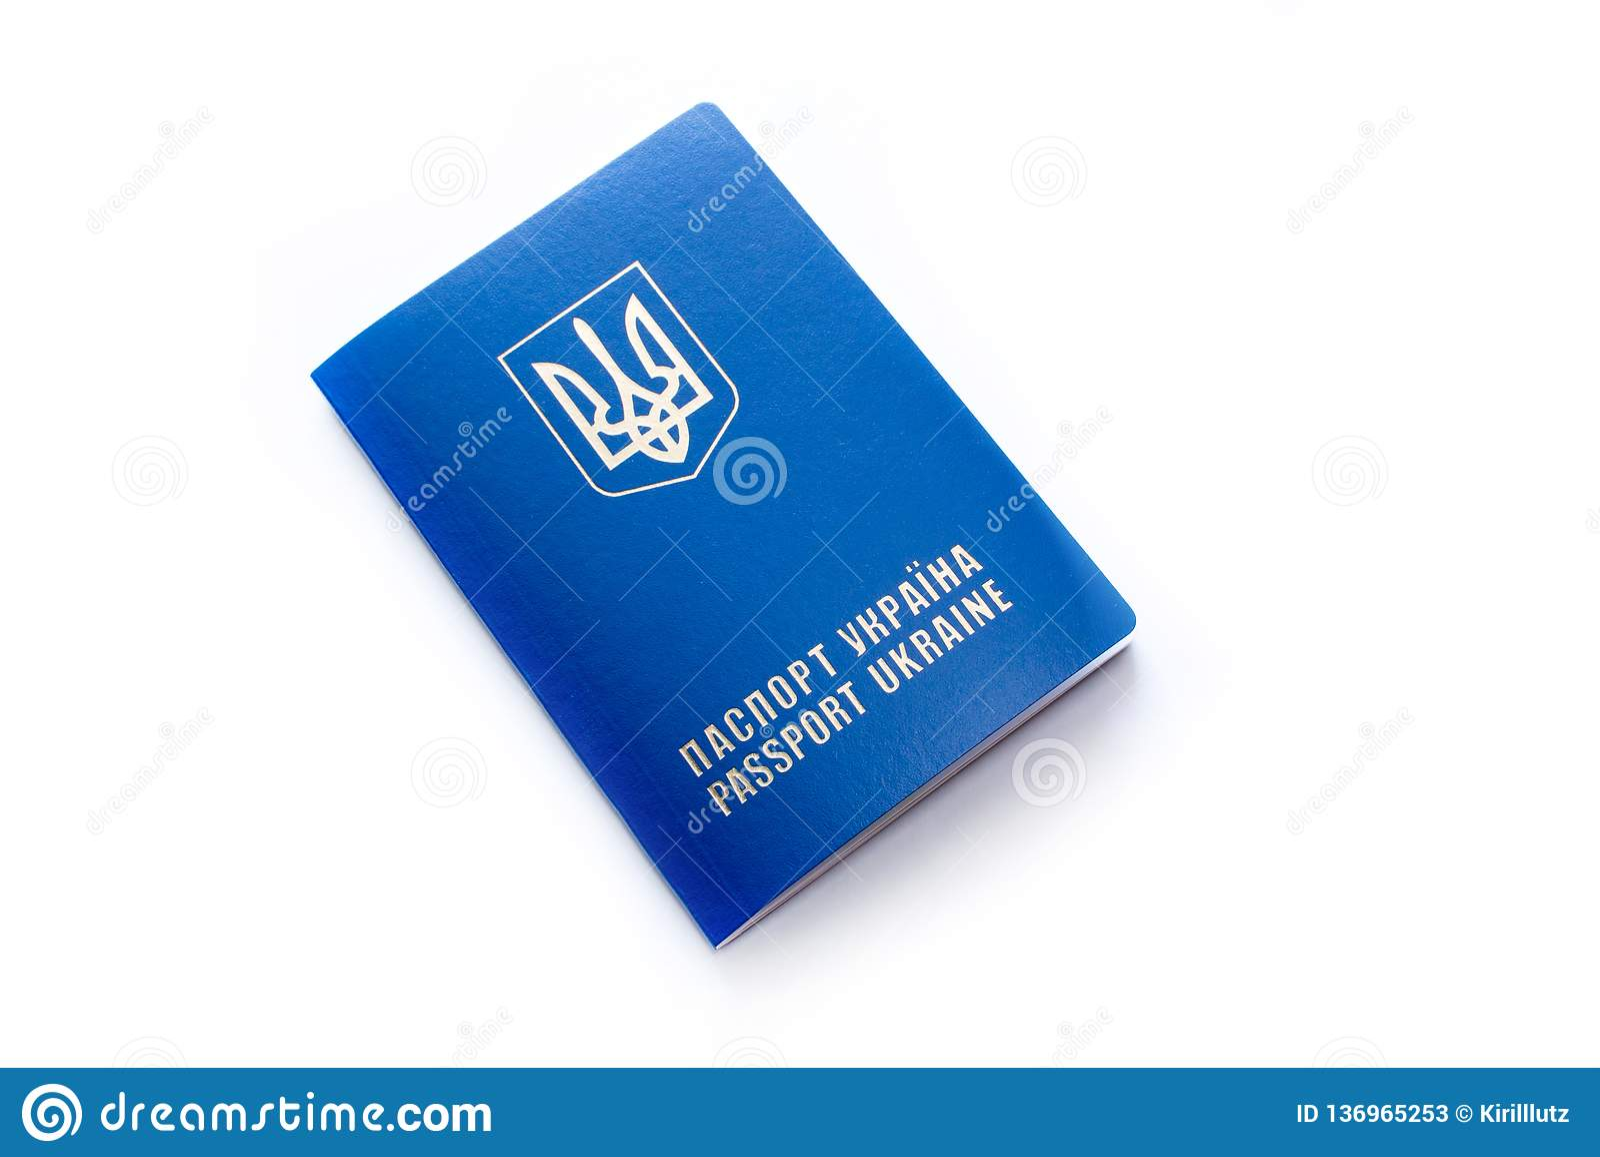 Passaporte ucraniano, isolado no branco